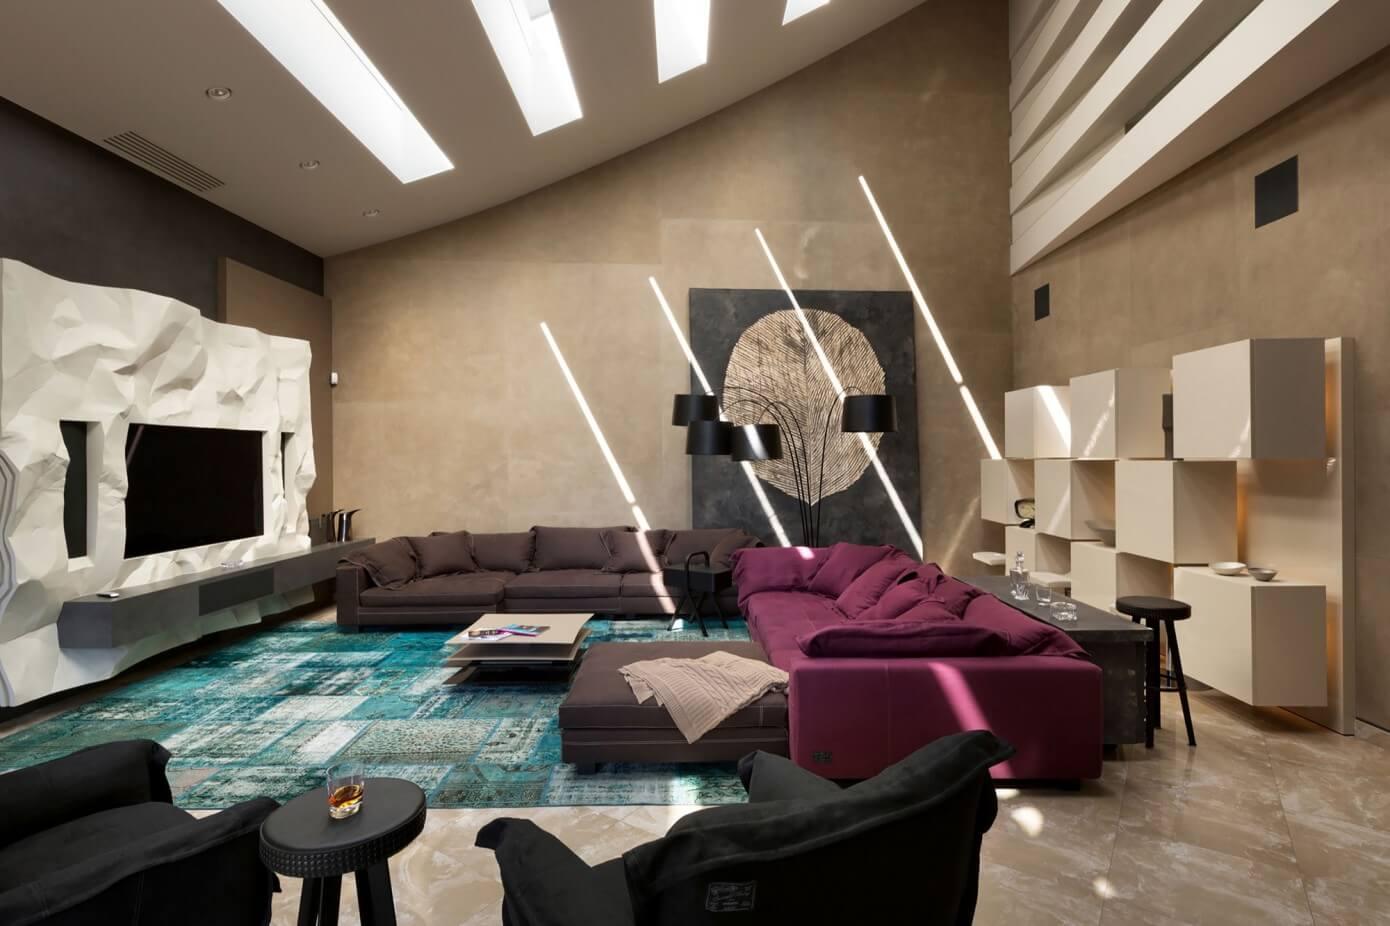 Contemporary House in Kharkov by SBM Studio